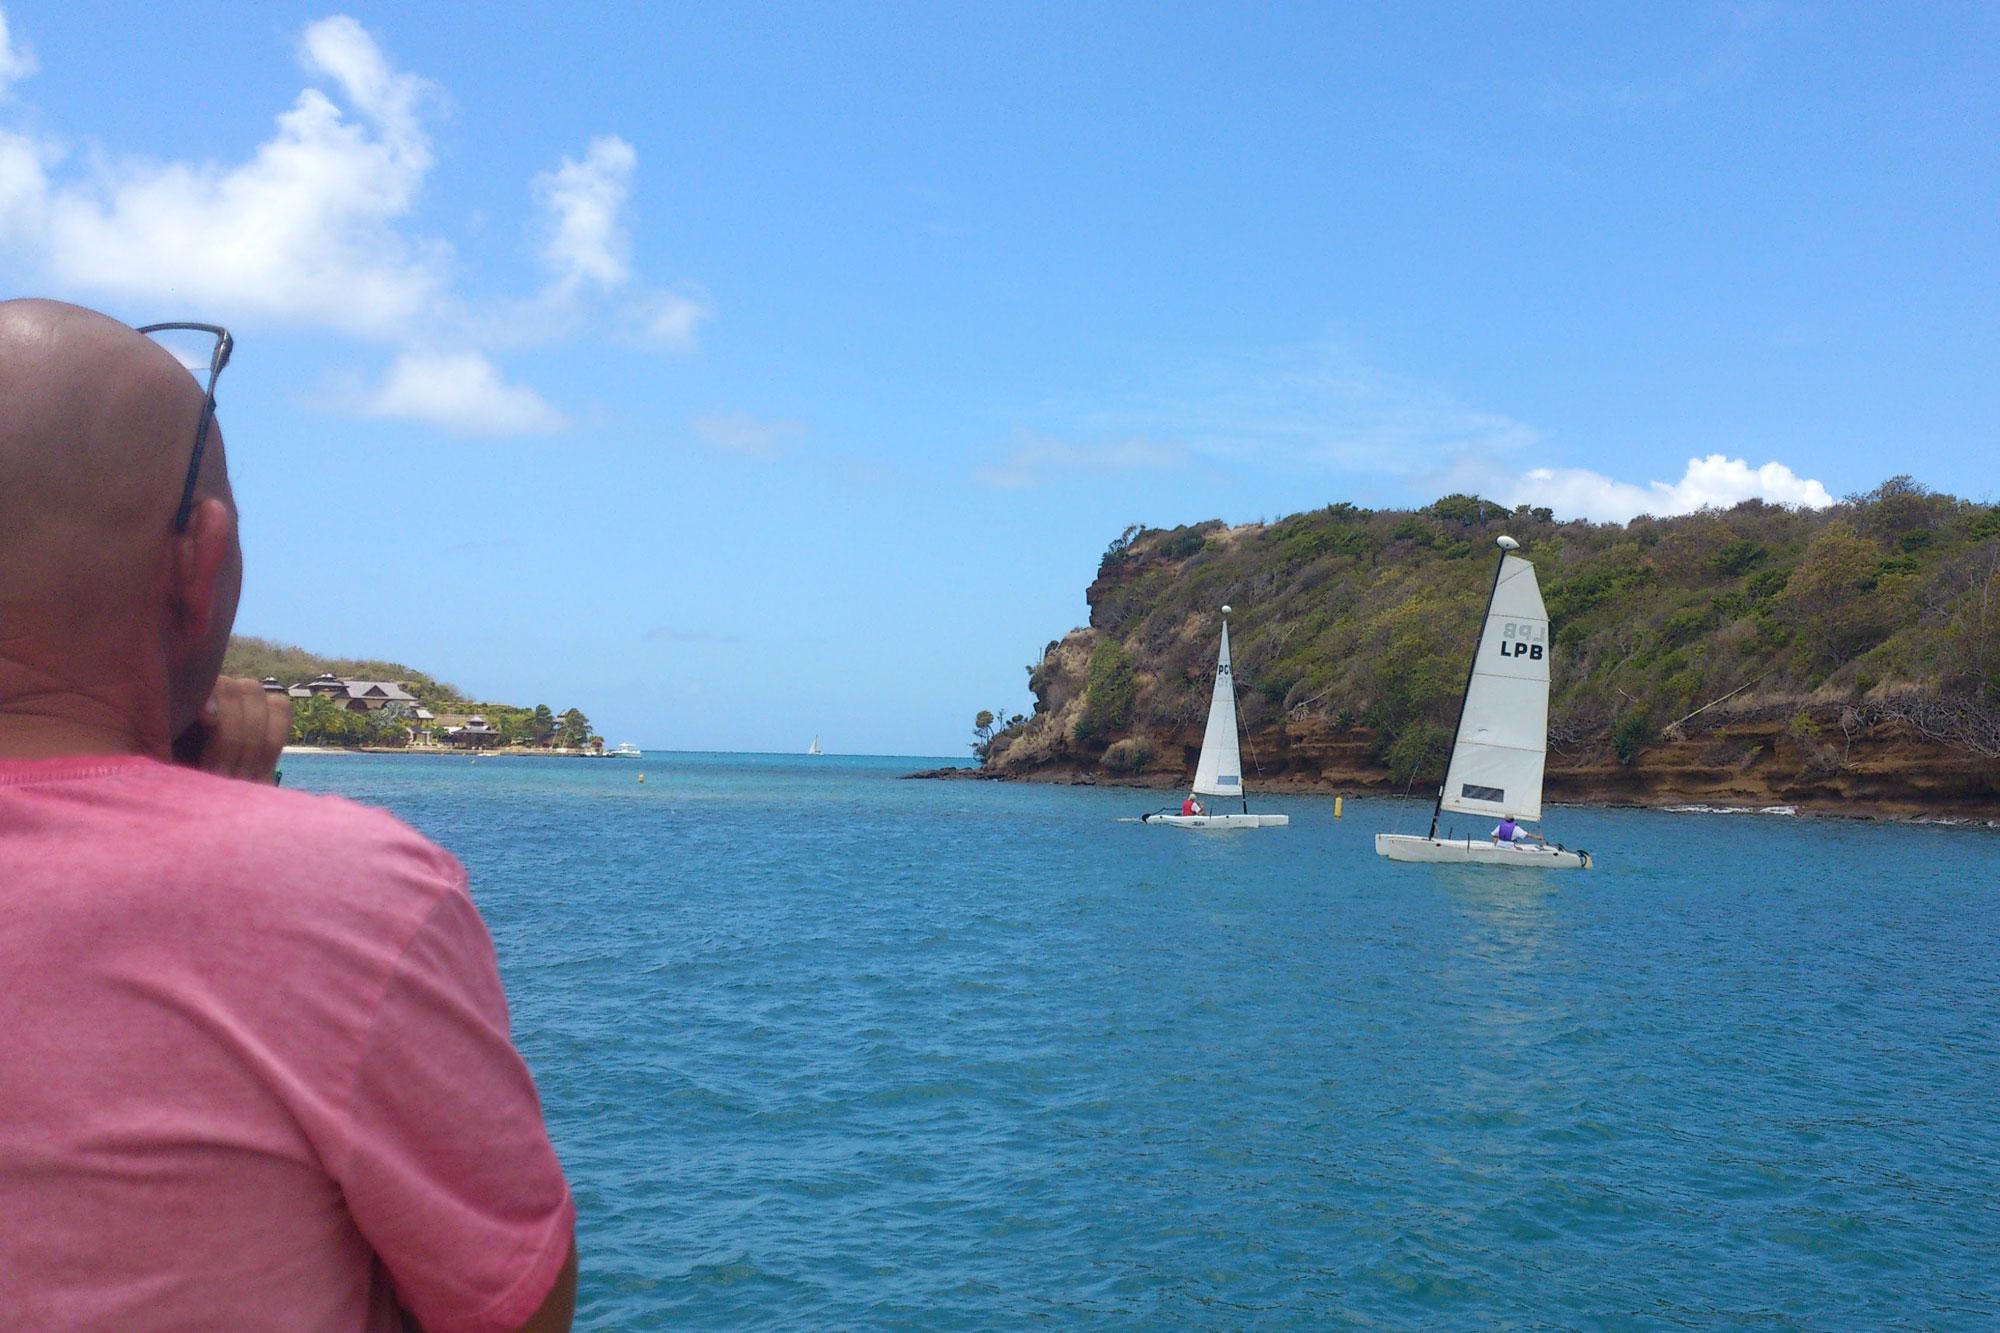 Hobie Cat sailing at Le Phare Bleu